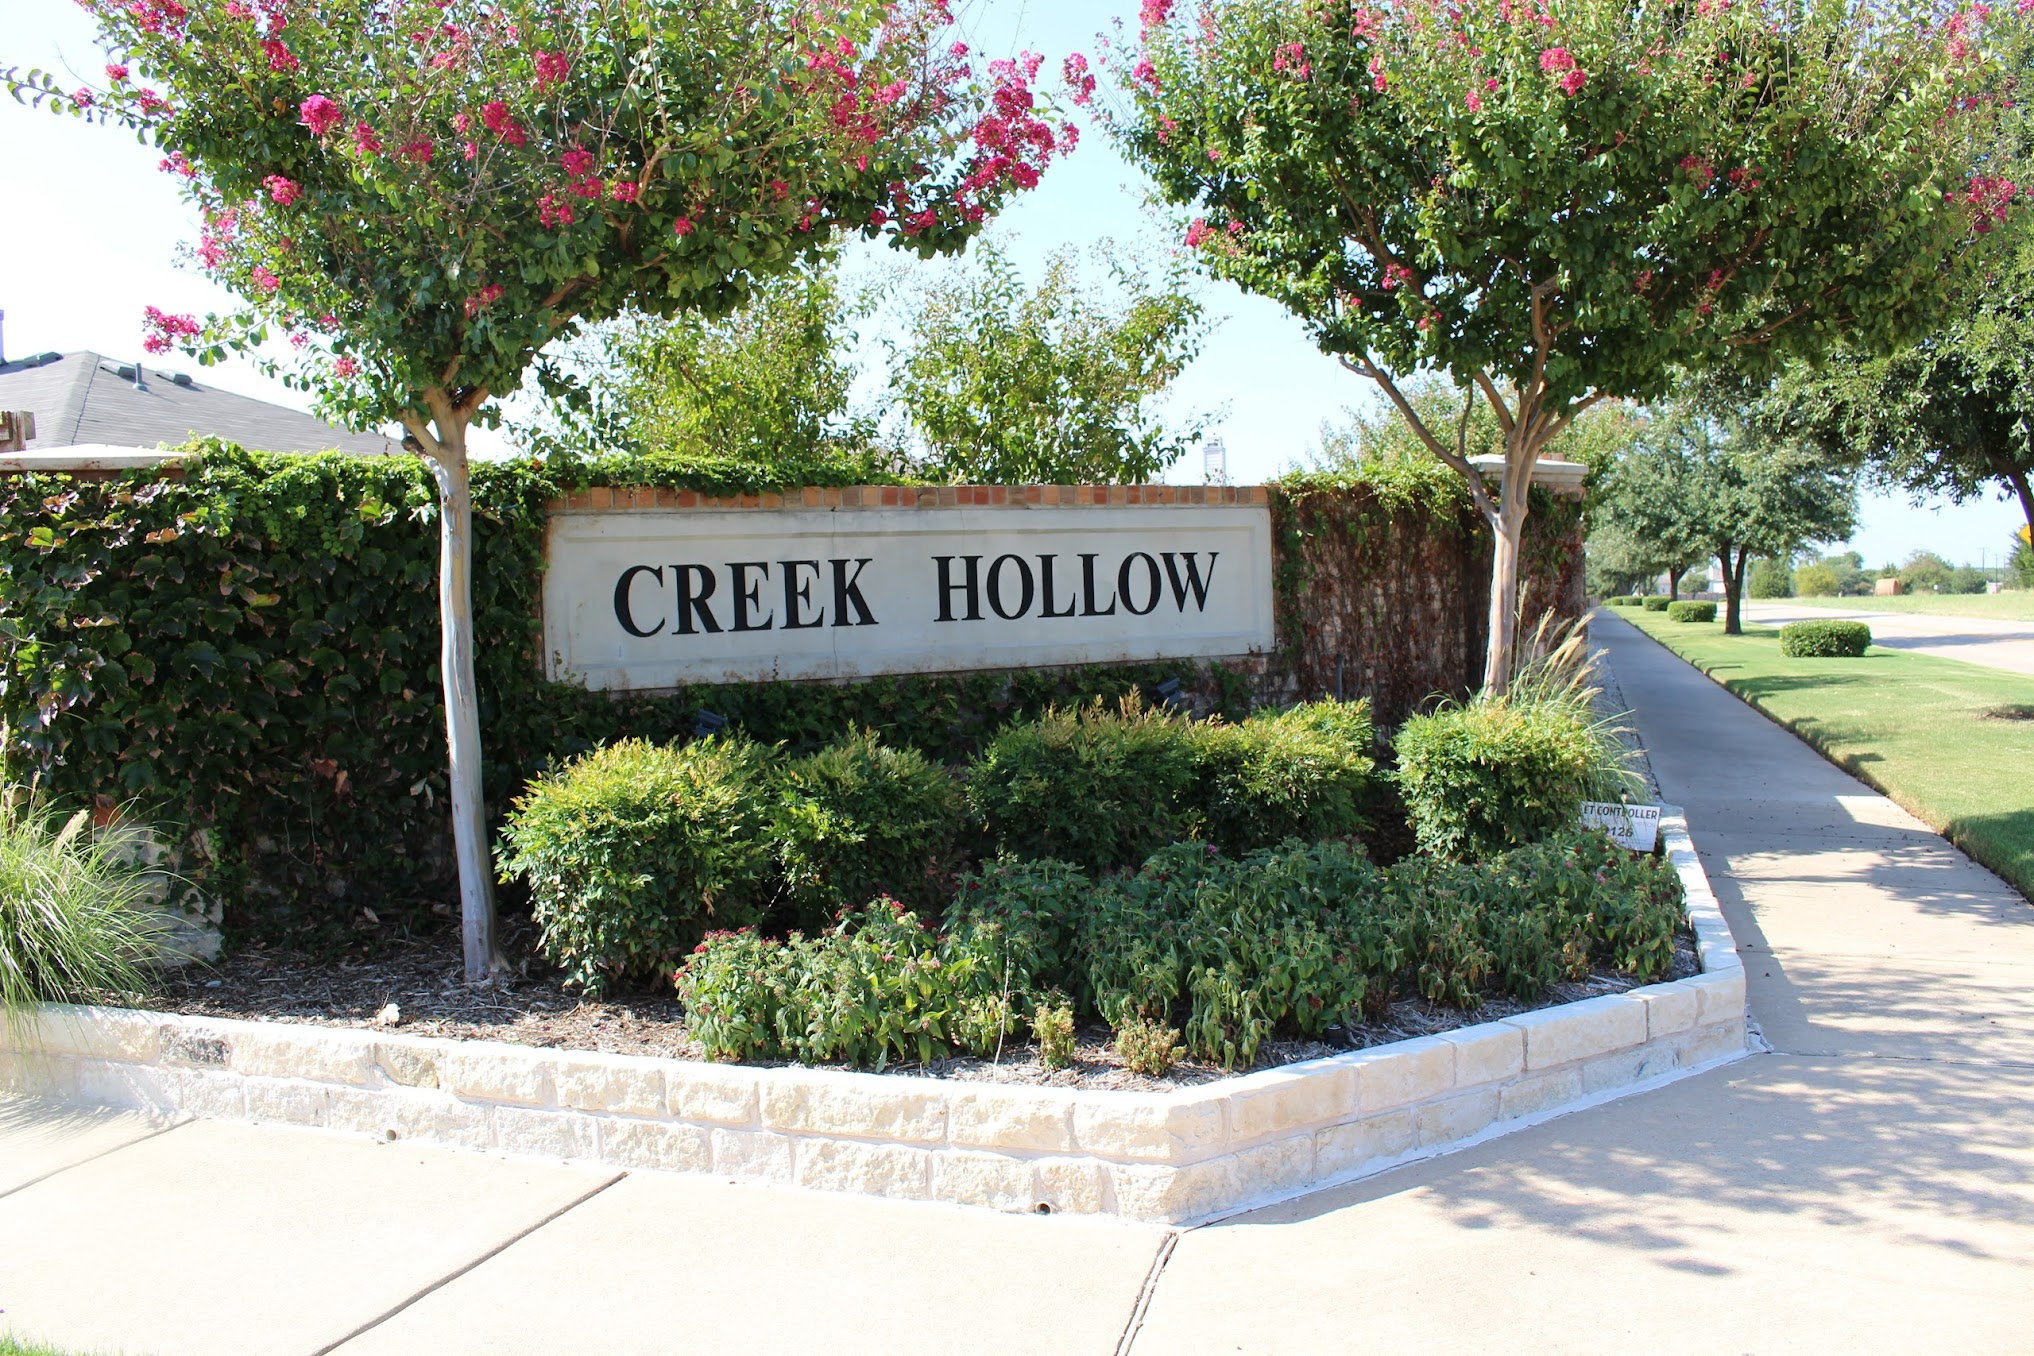 Creekhollow McKinney Entrance